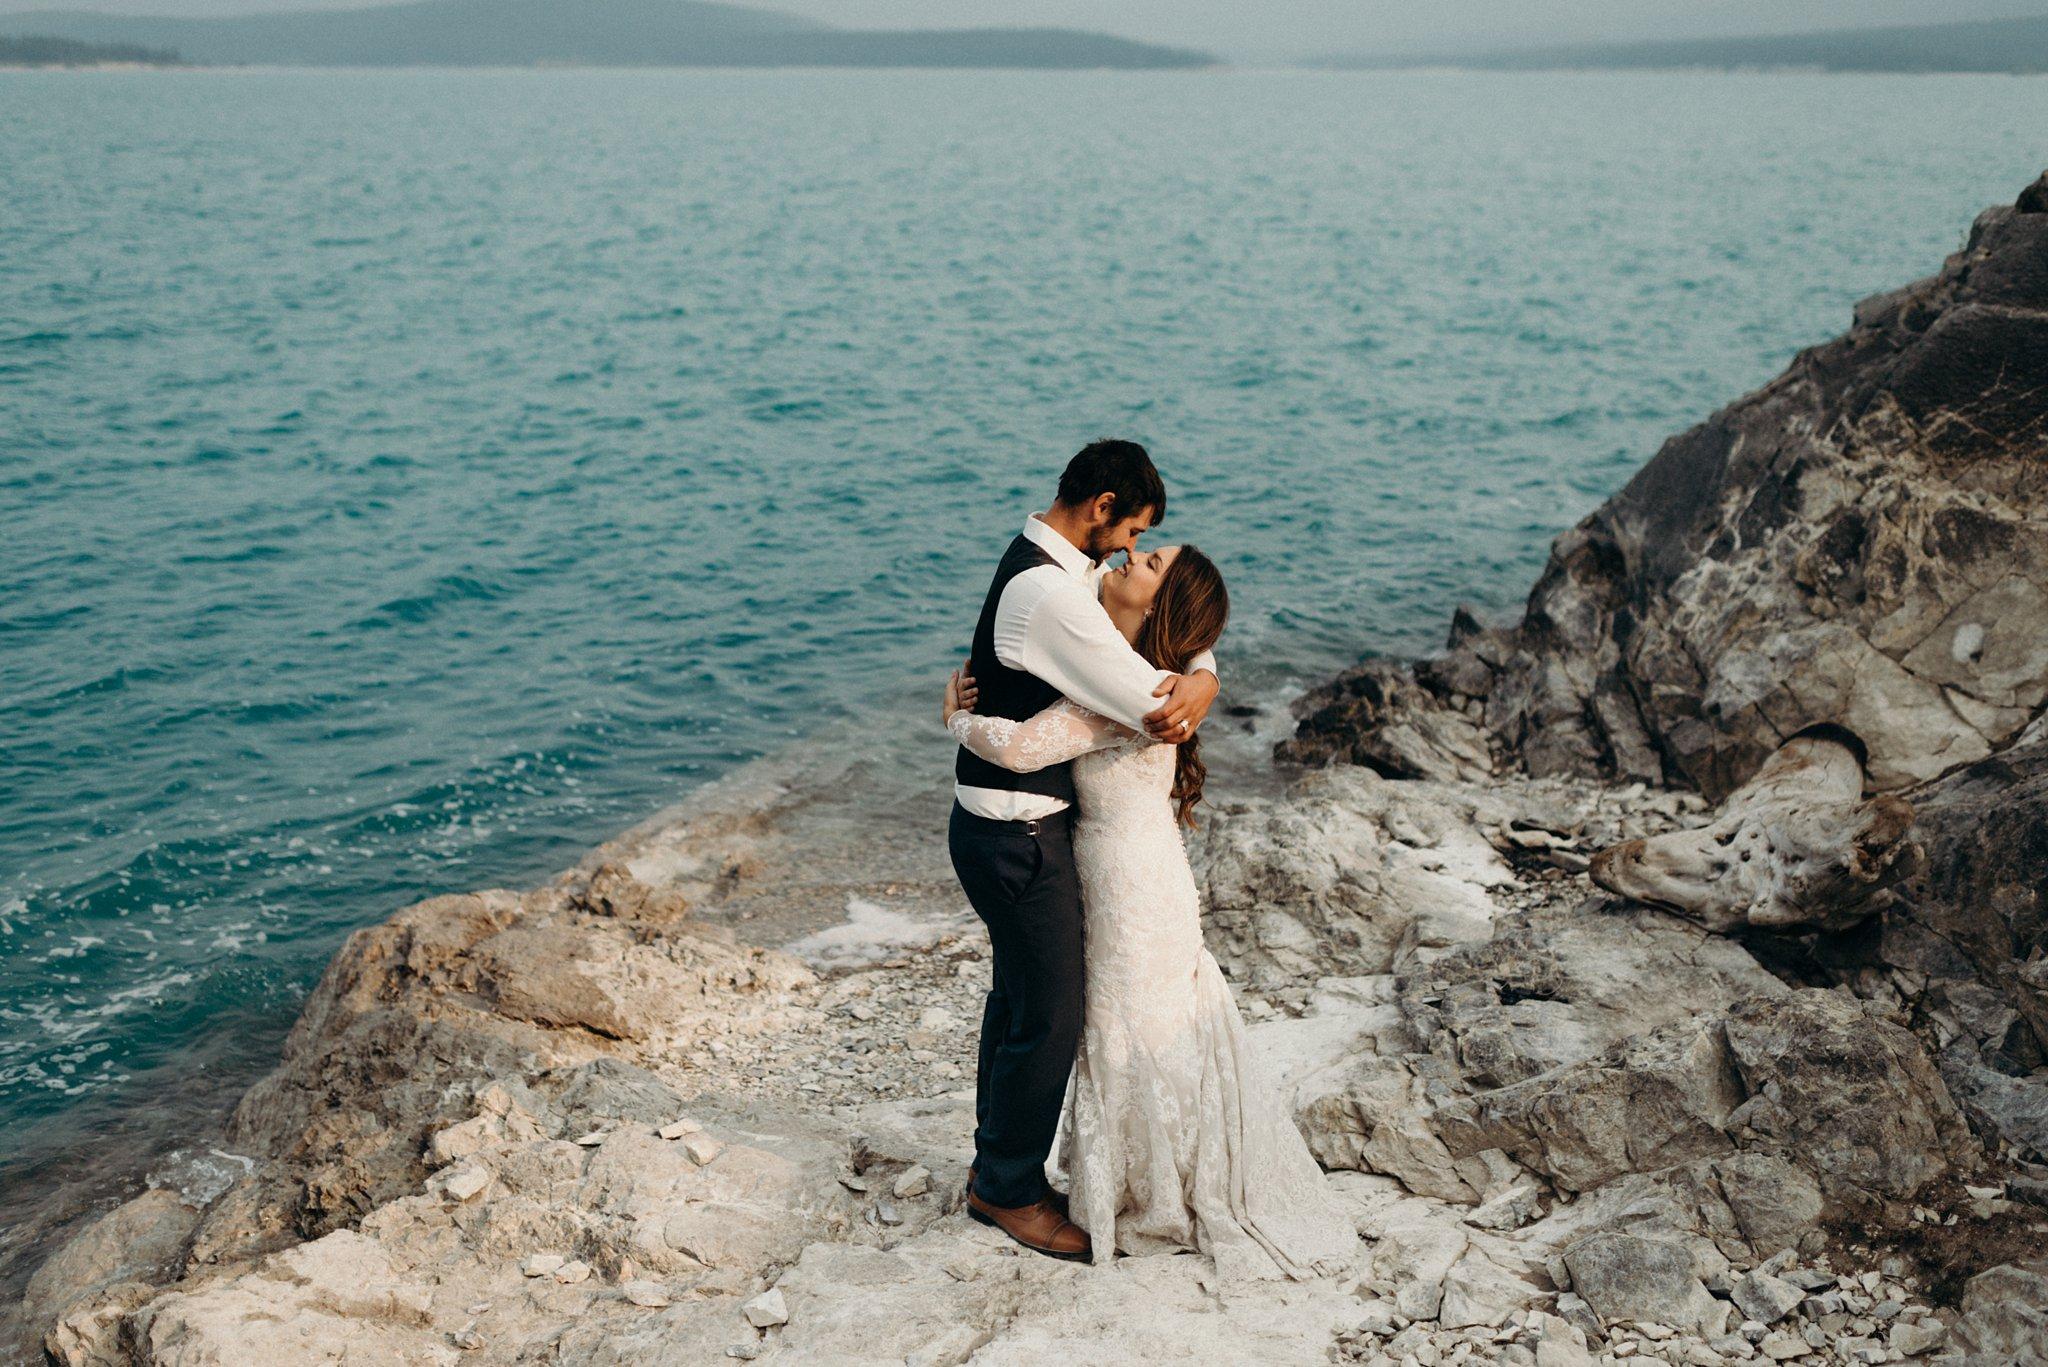 kaihla_tonai_intimate_wedding_elopement_photographer_6753.jpg